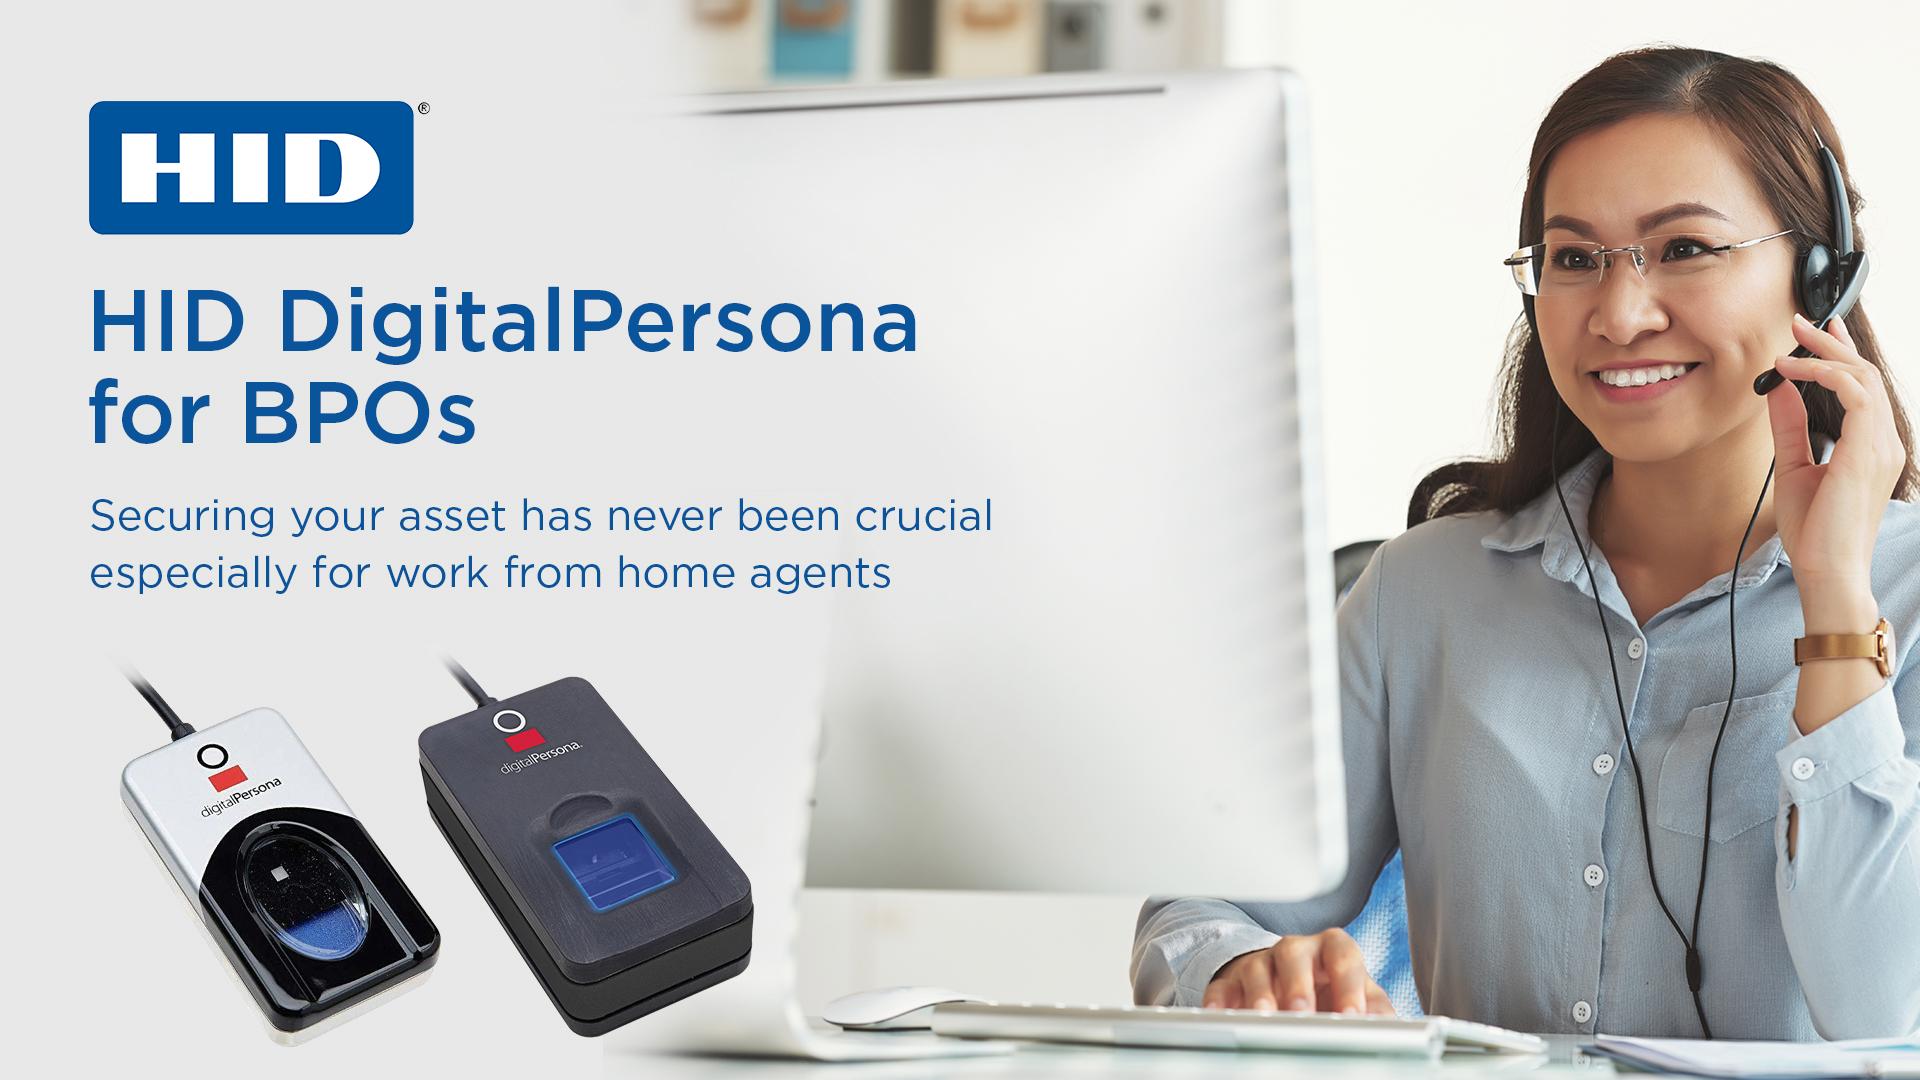 HID DigitalPersona